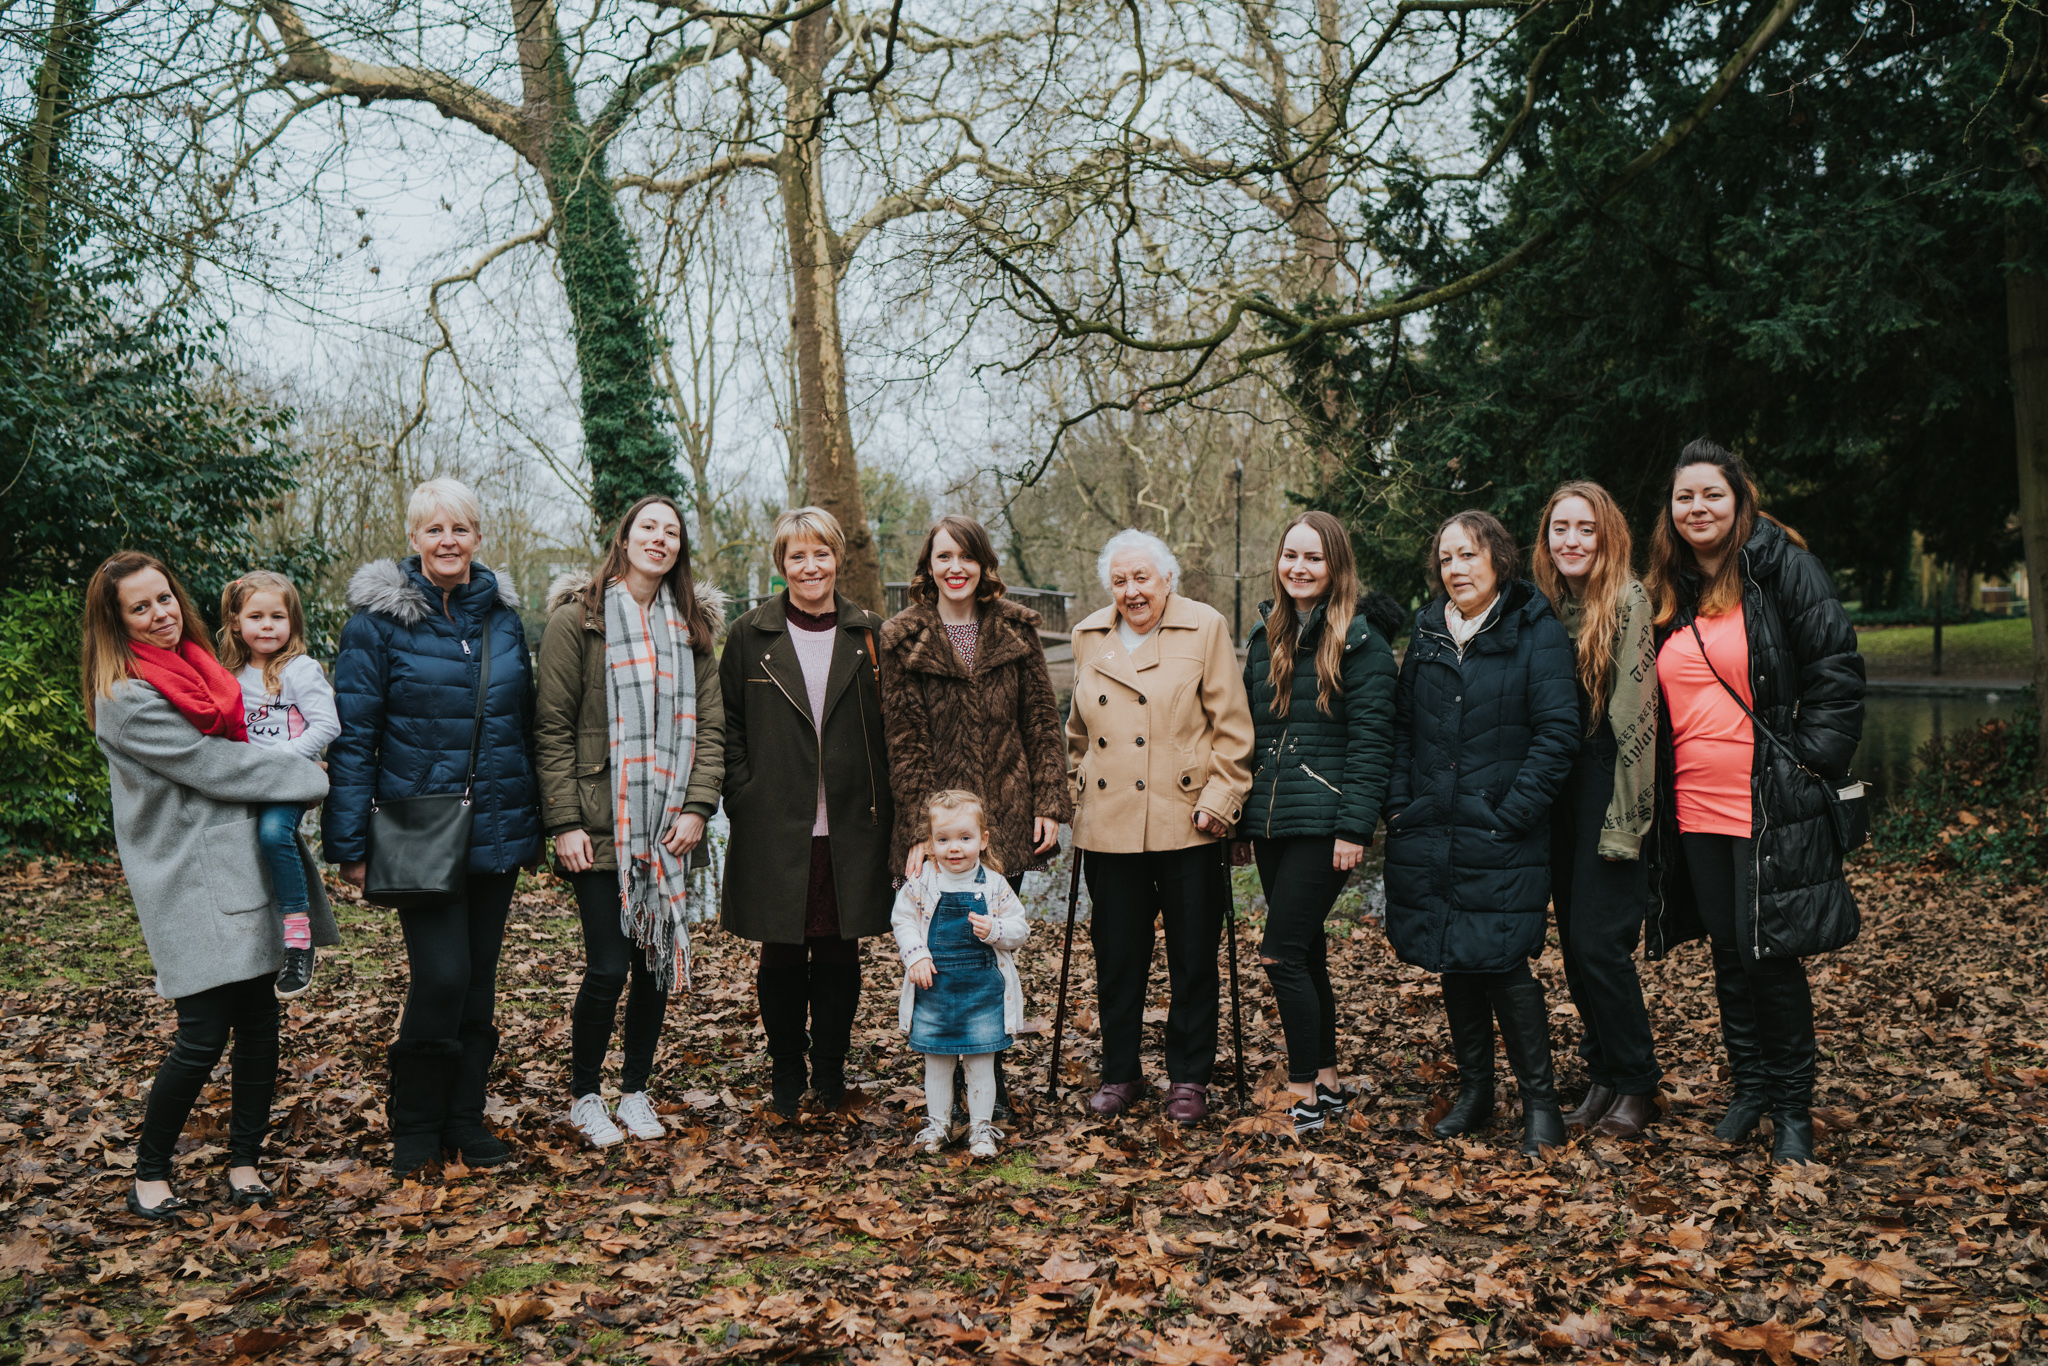 Hertfordshire-extended-family-session-grace-elizabeth-colchester-essex-alternative-wedding-photographer-suffolk-devon-norfolk (24 of 26).jpg